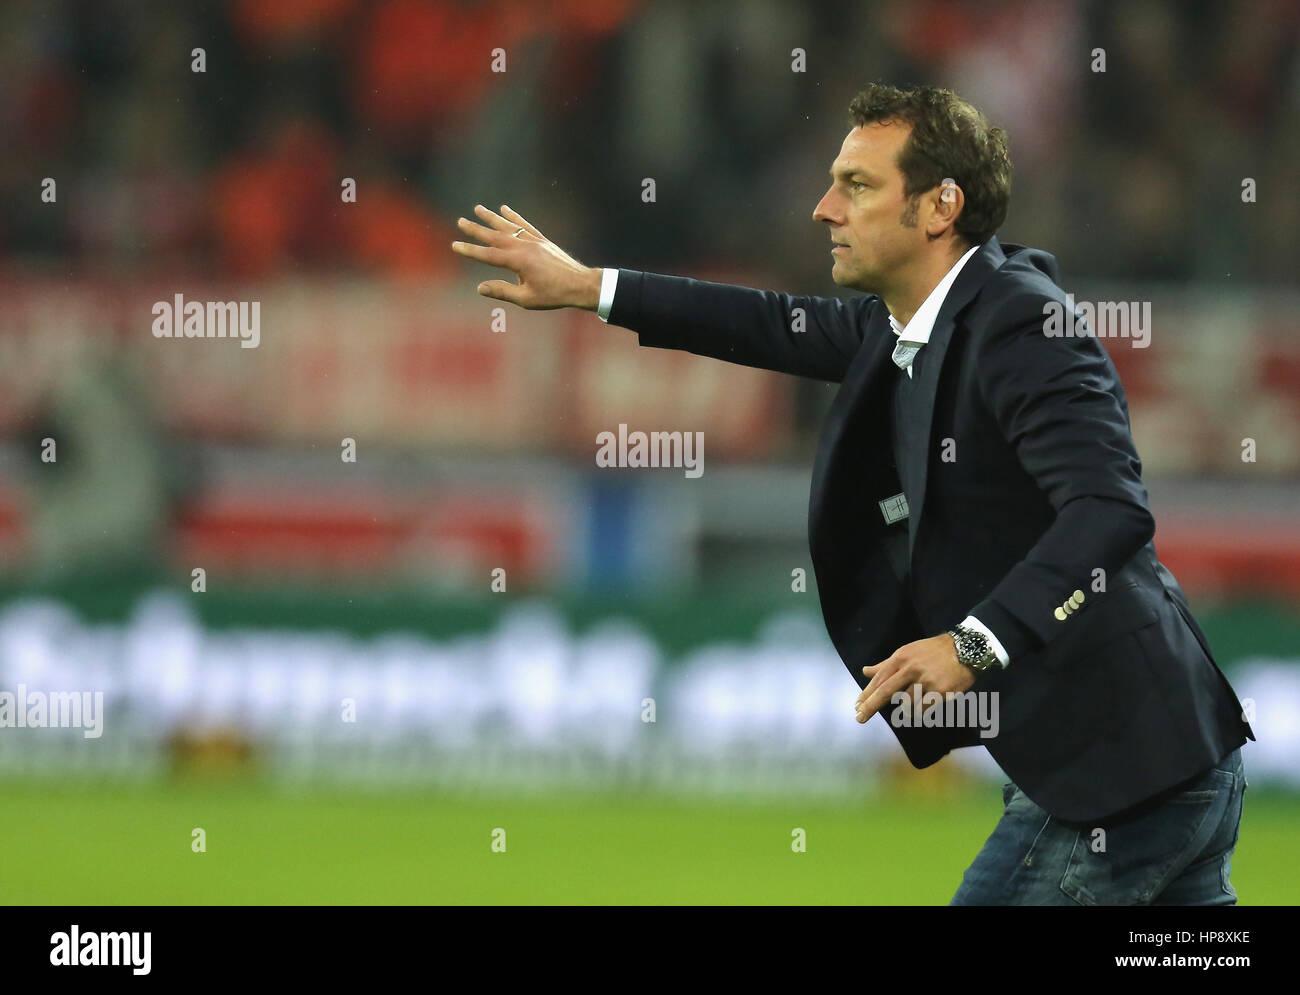 Cologne, Germany, February 19, 2017, Bundesliga matchday 21, 1. FC Koeln - FC Schalke 04:  Manager Markus Weinzierl - Stock Image